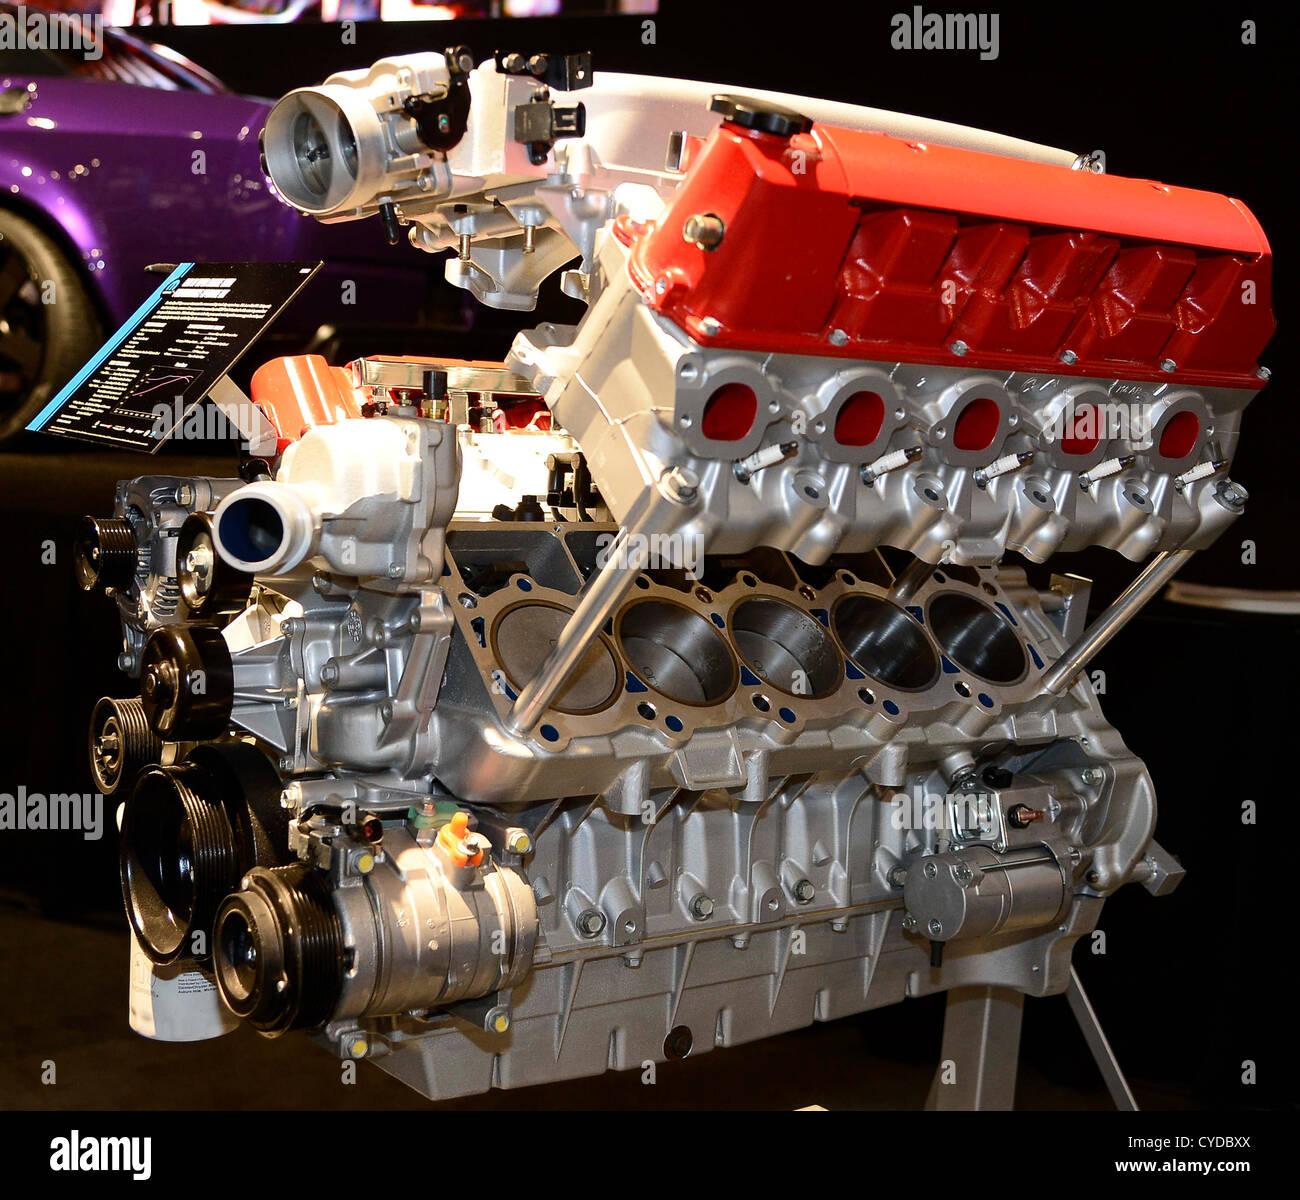 Dodge Viper Engine Stock Photos & Dodge Viper Engine Stock